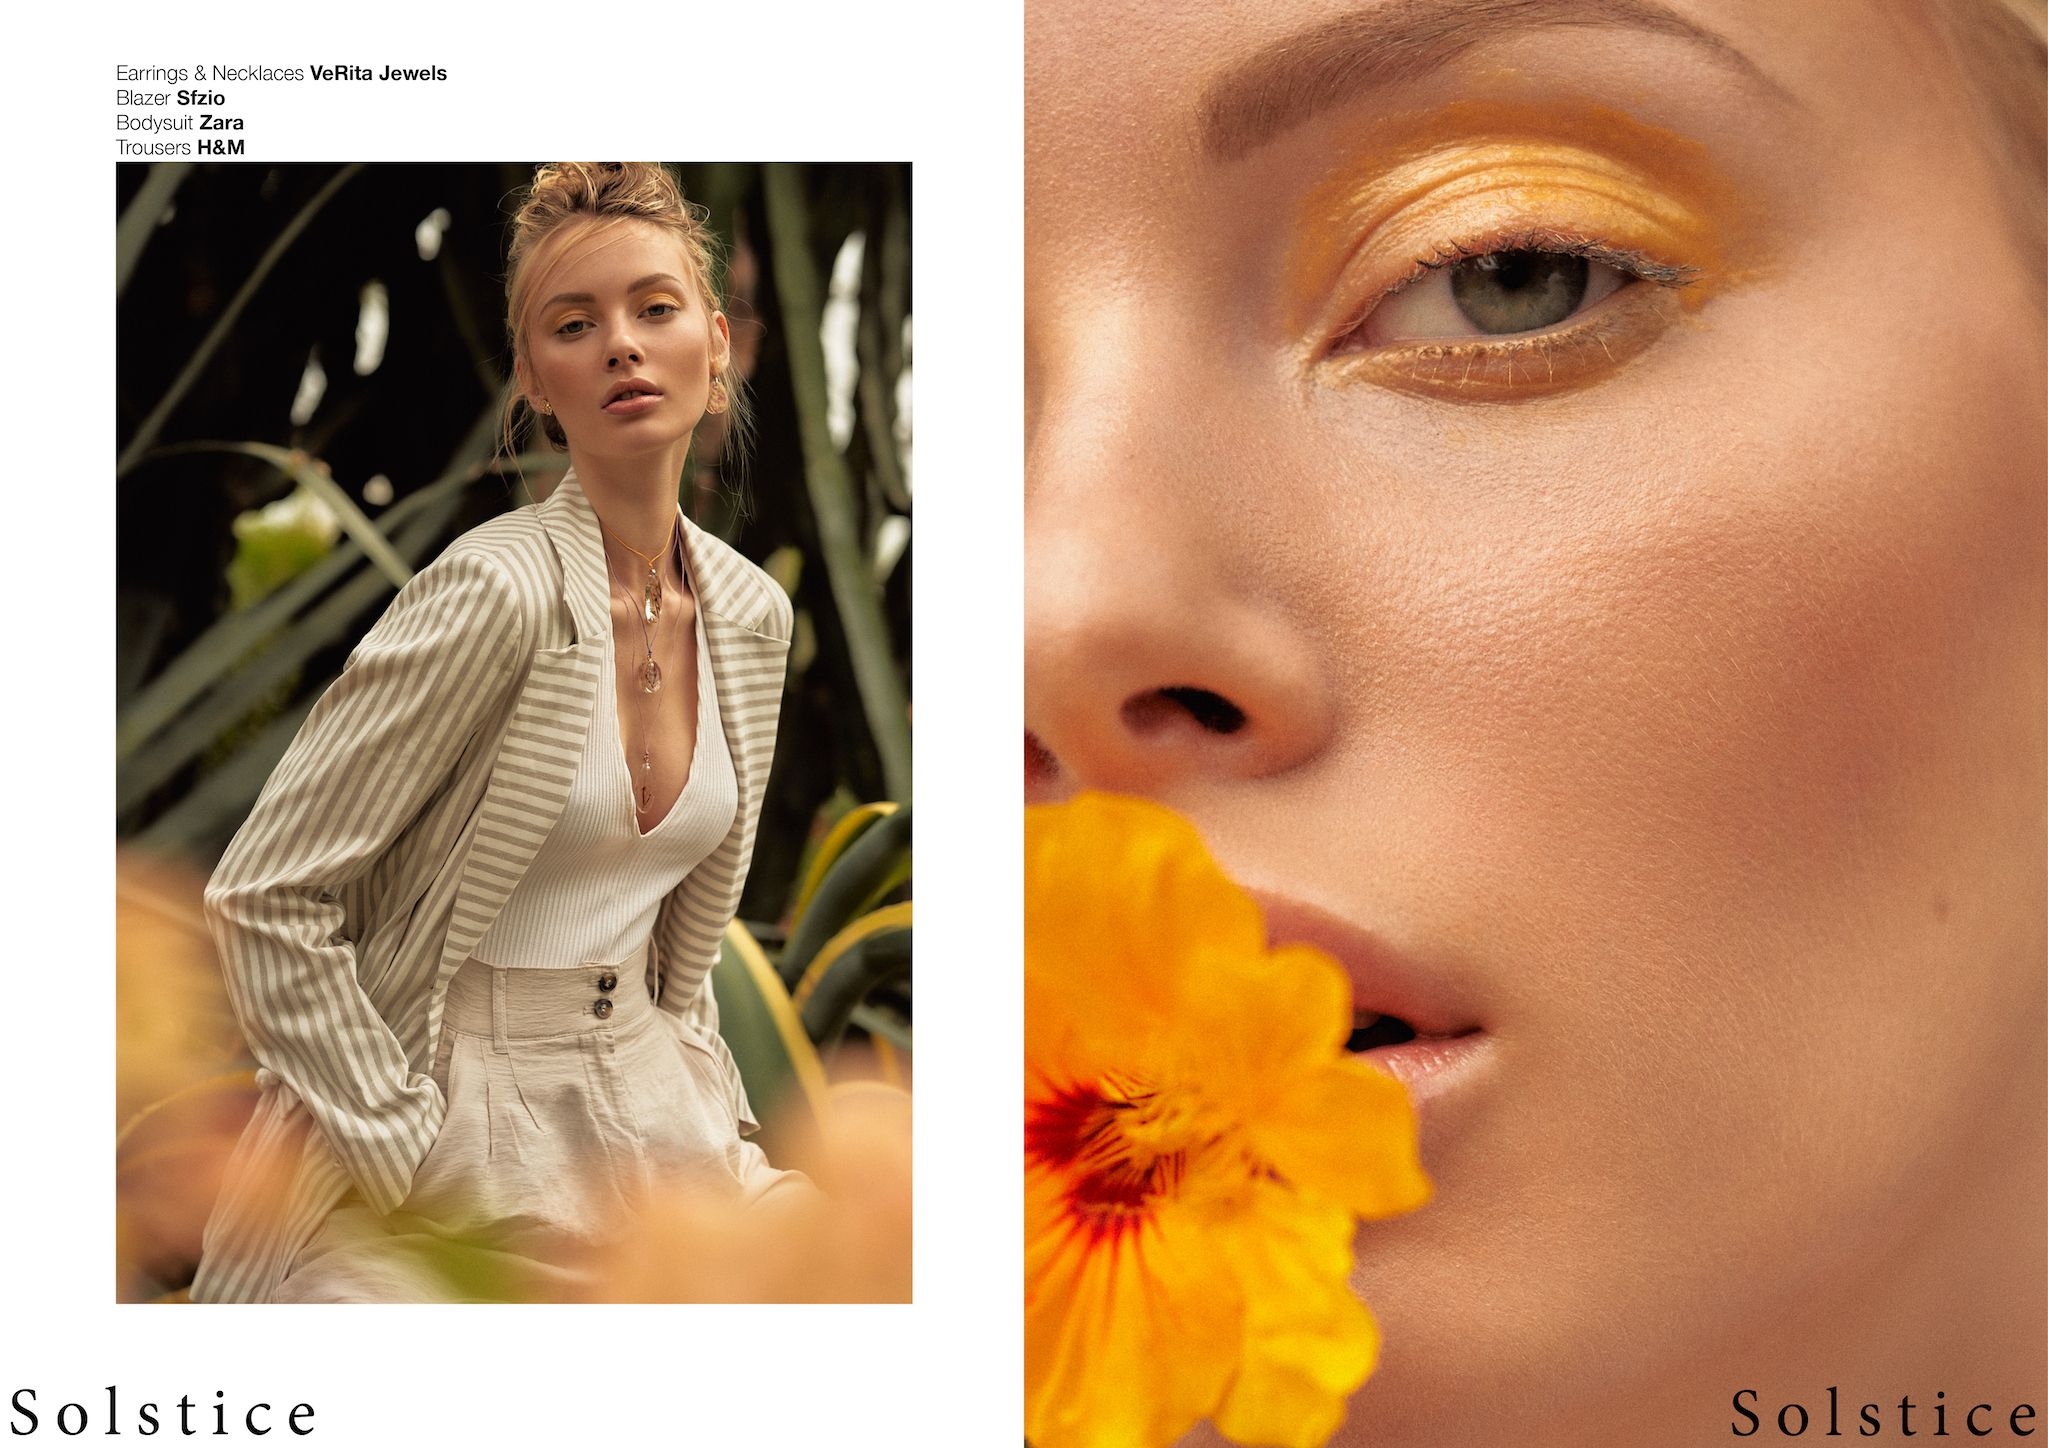 Garden of Eden - Solstice Magazine UK - Pic. 2